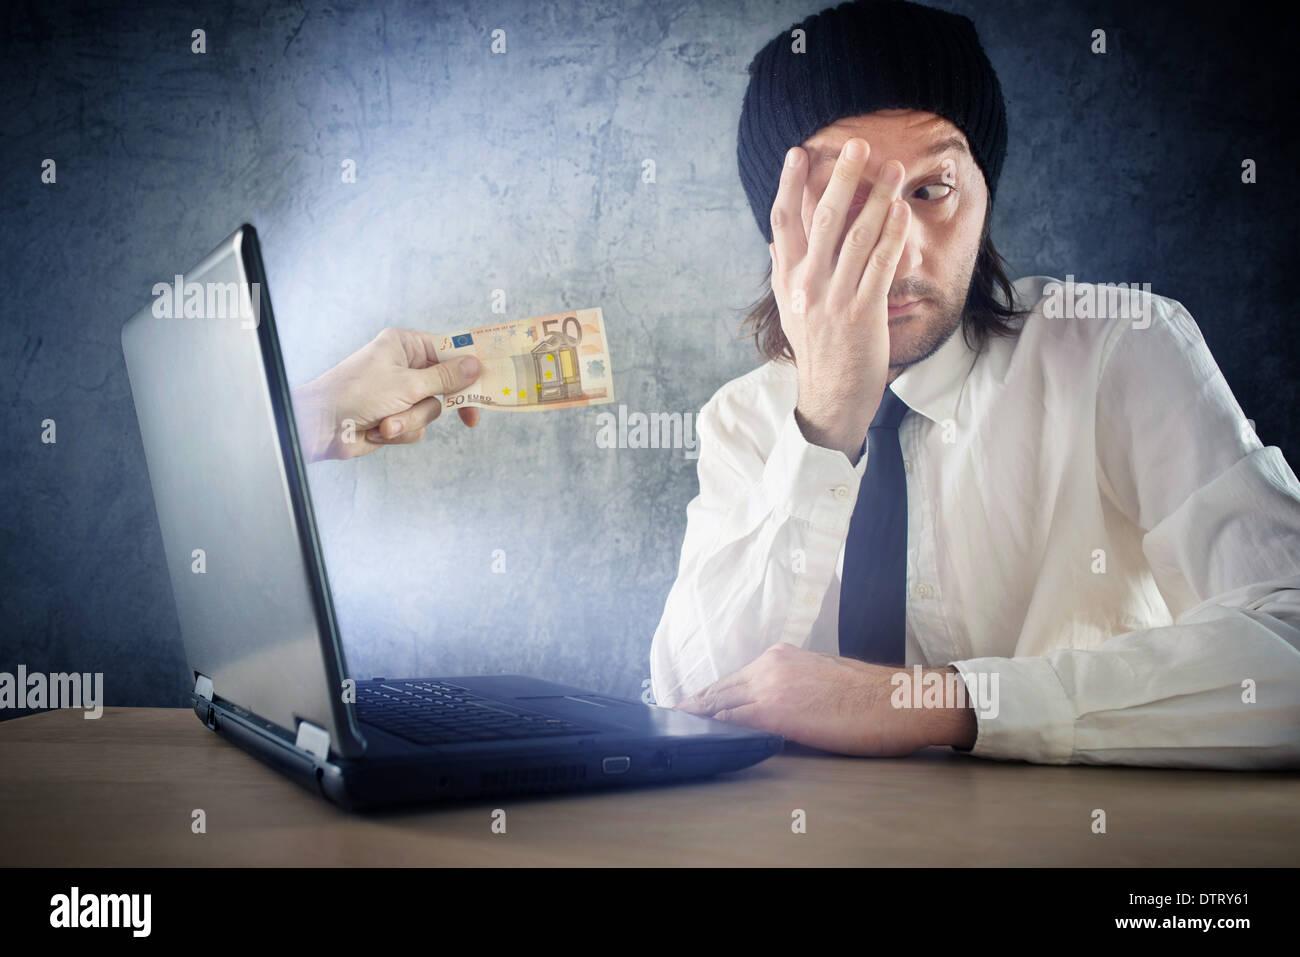 Online money funds, surprised businessman receiving cash over internet. Earning money on network. - Stock Image